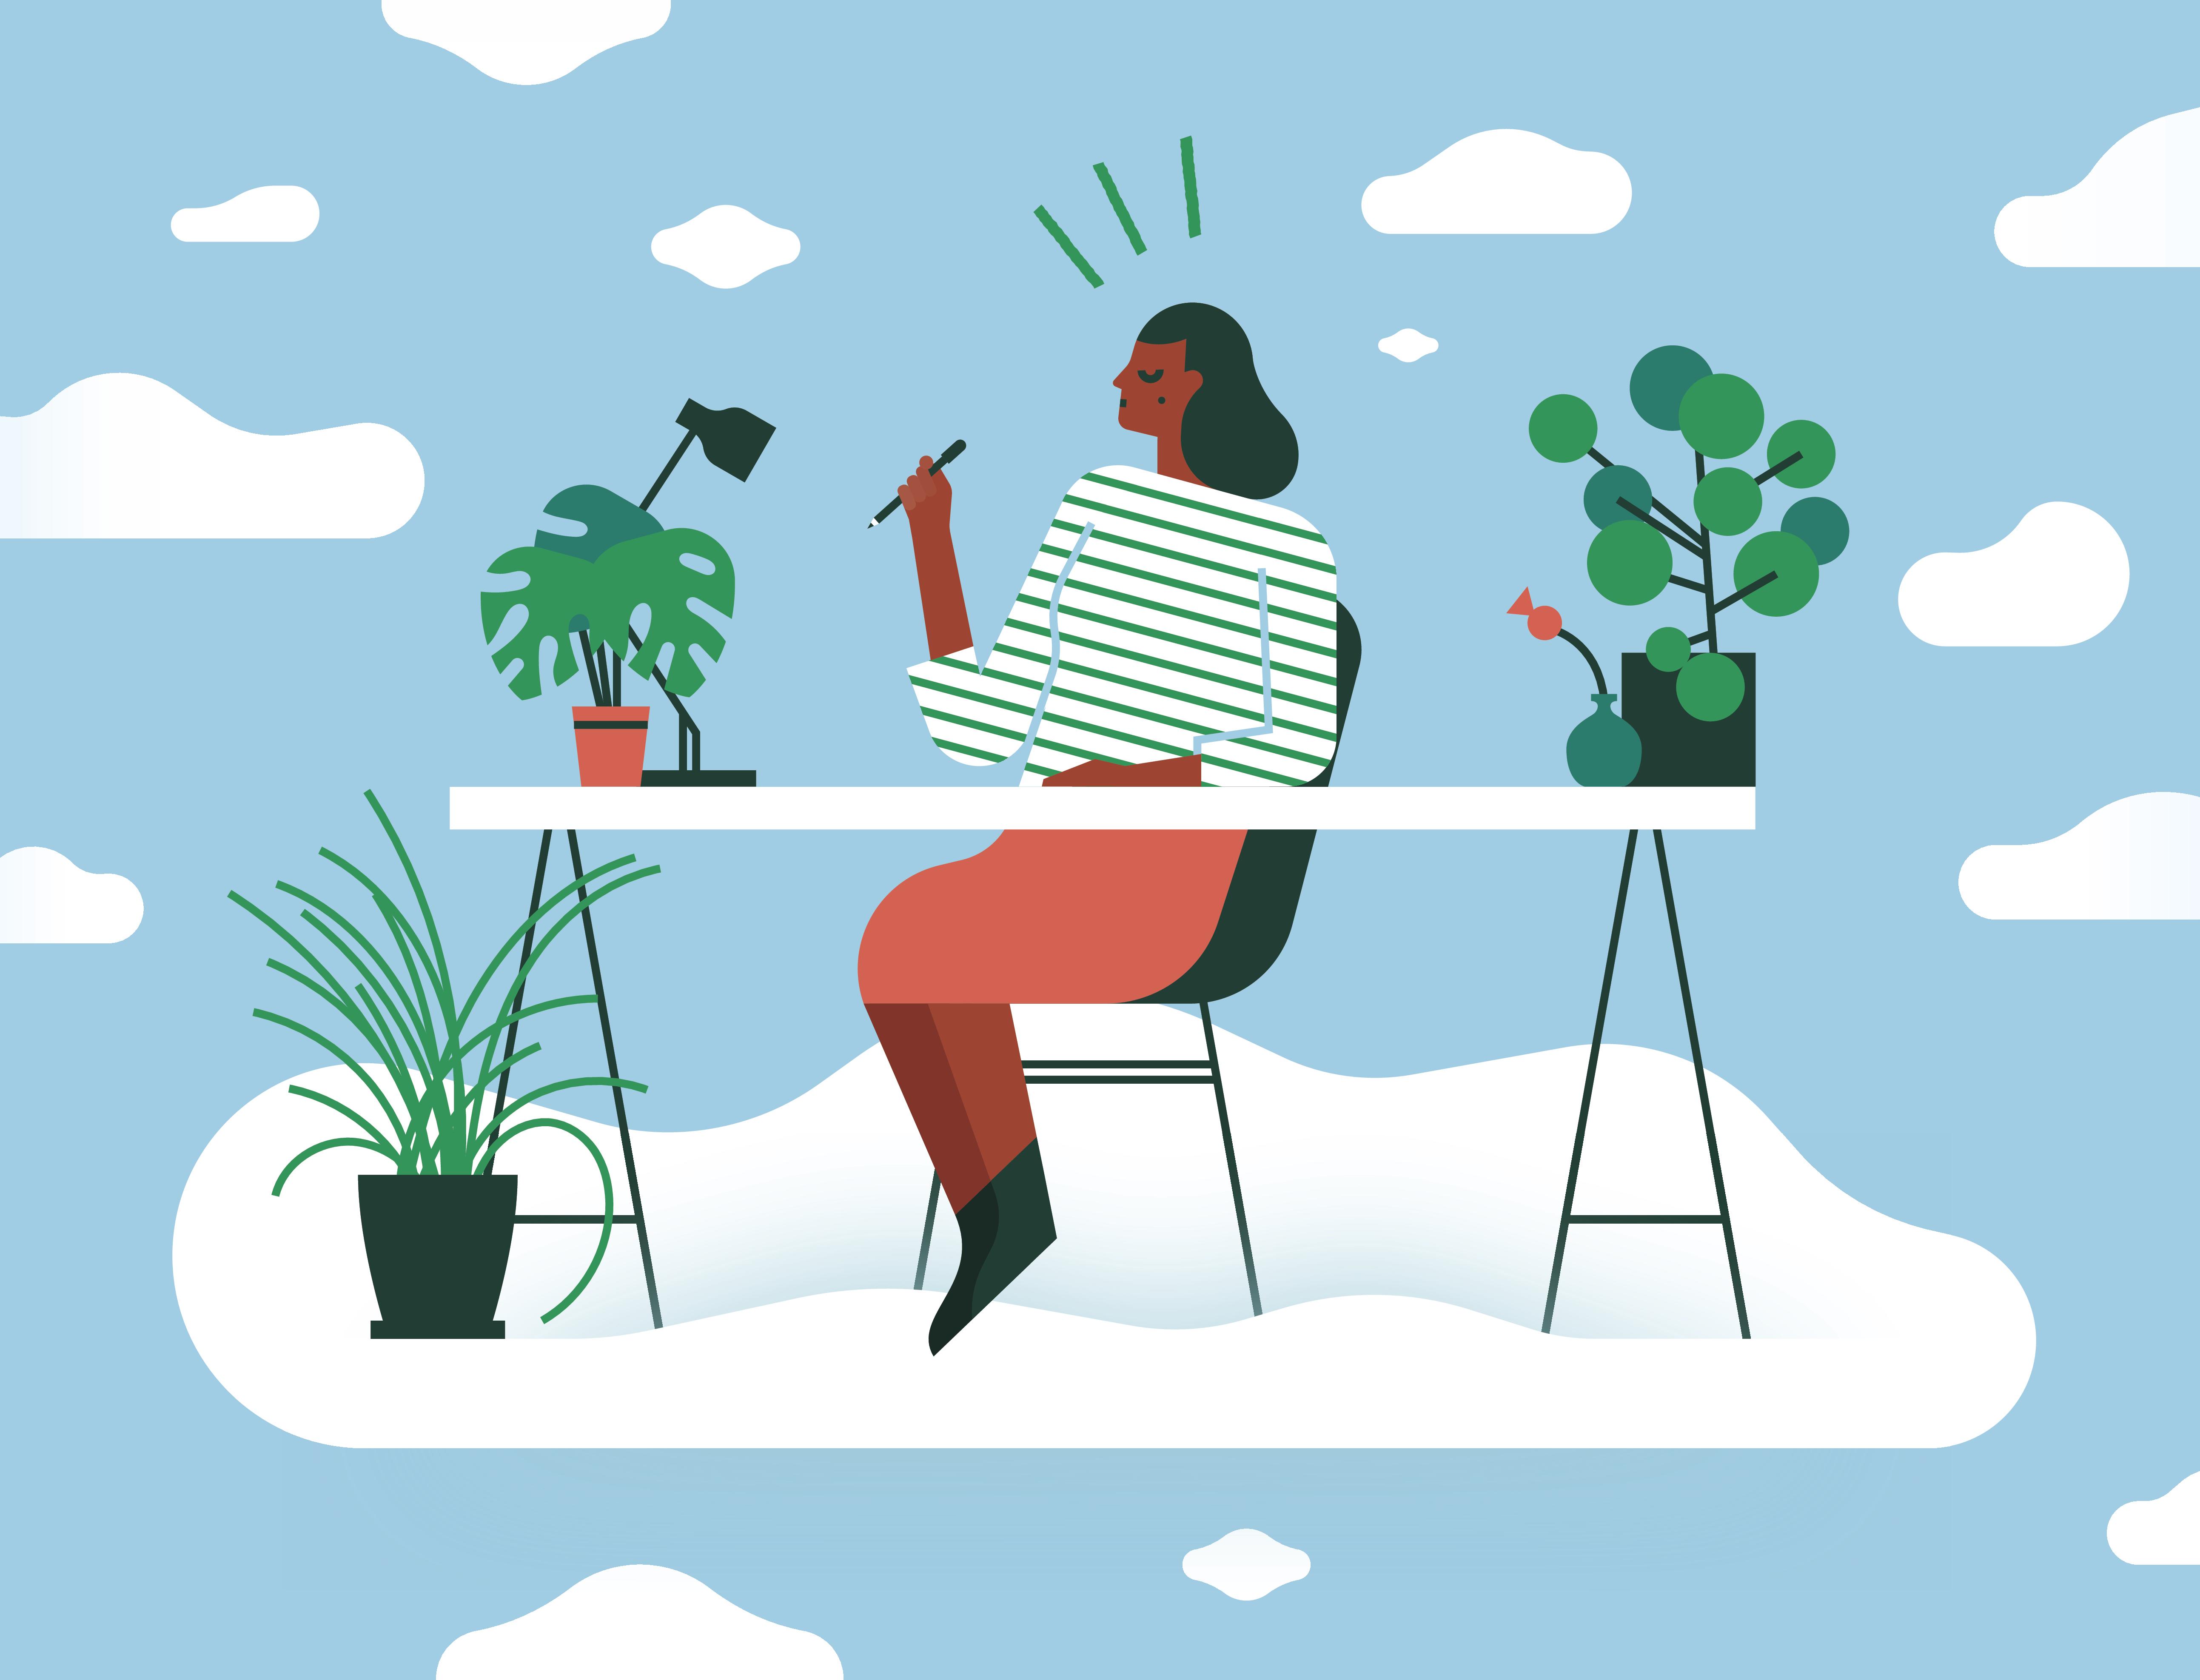 Calm woman meditating at desk